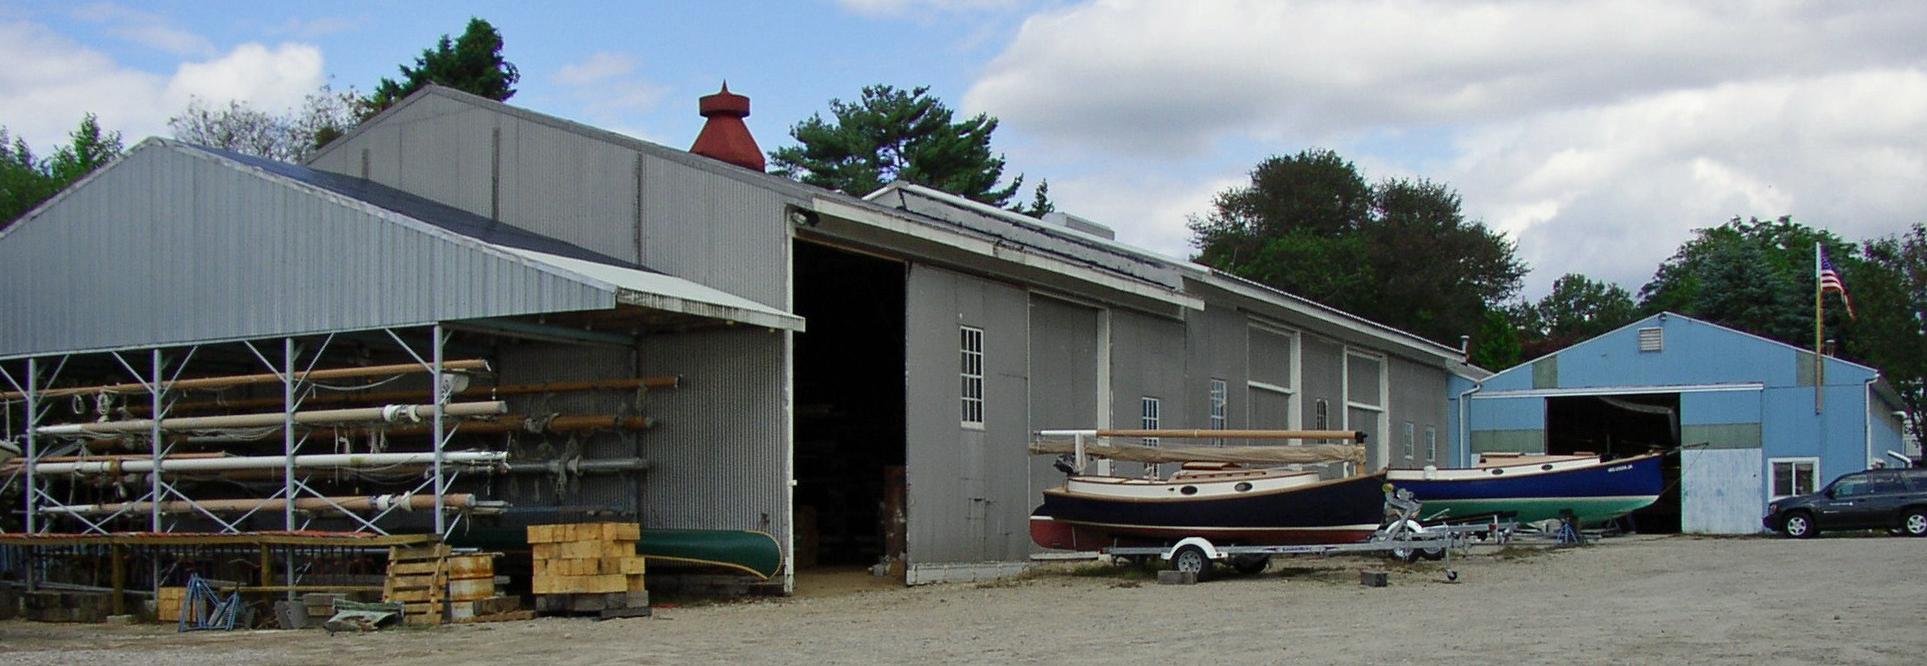 catboats 071 retouch.jpg